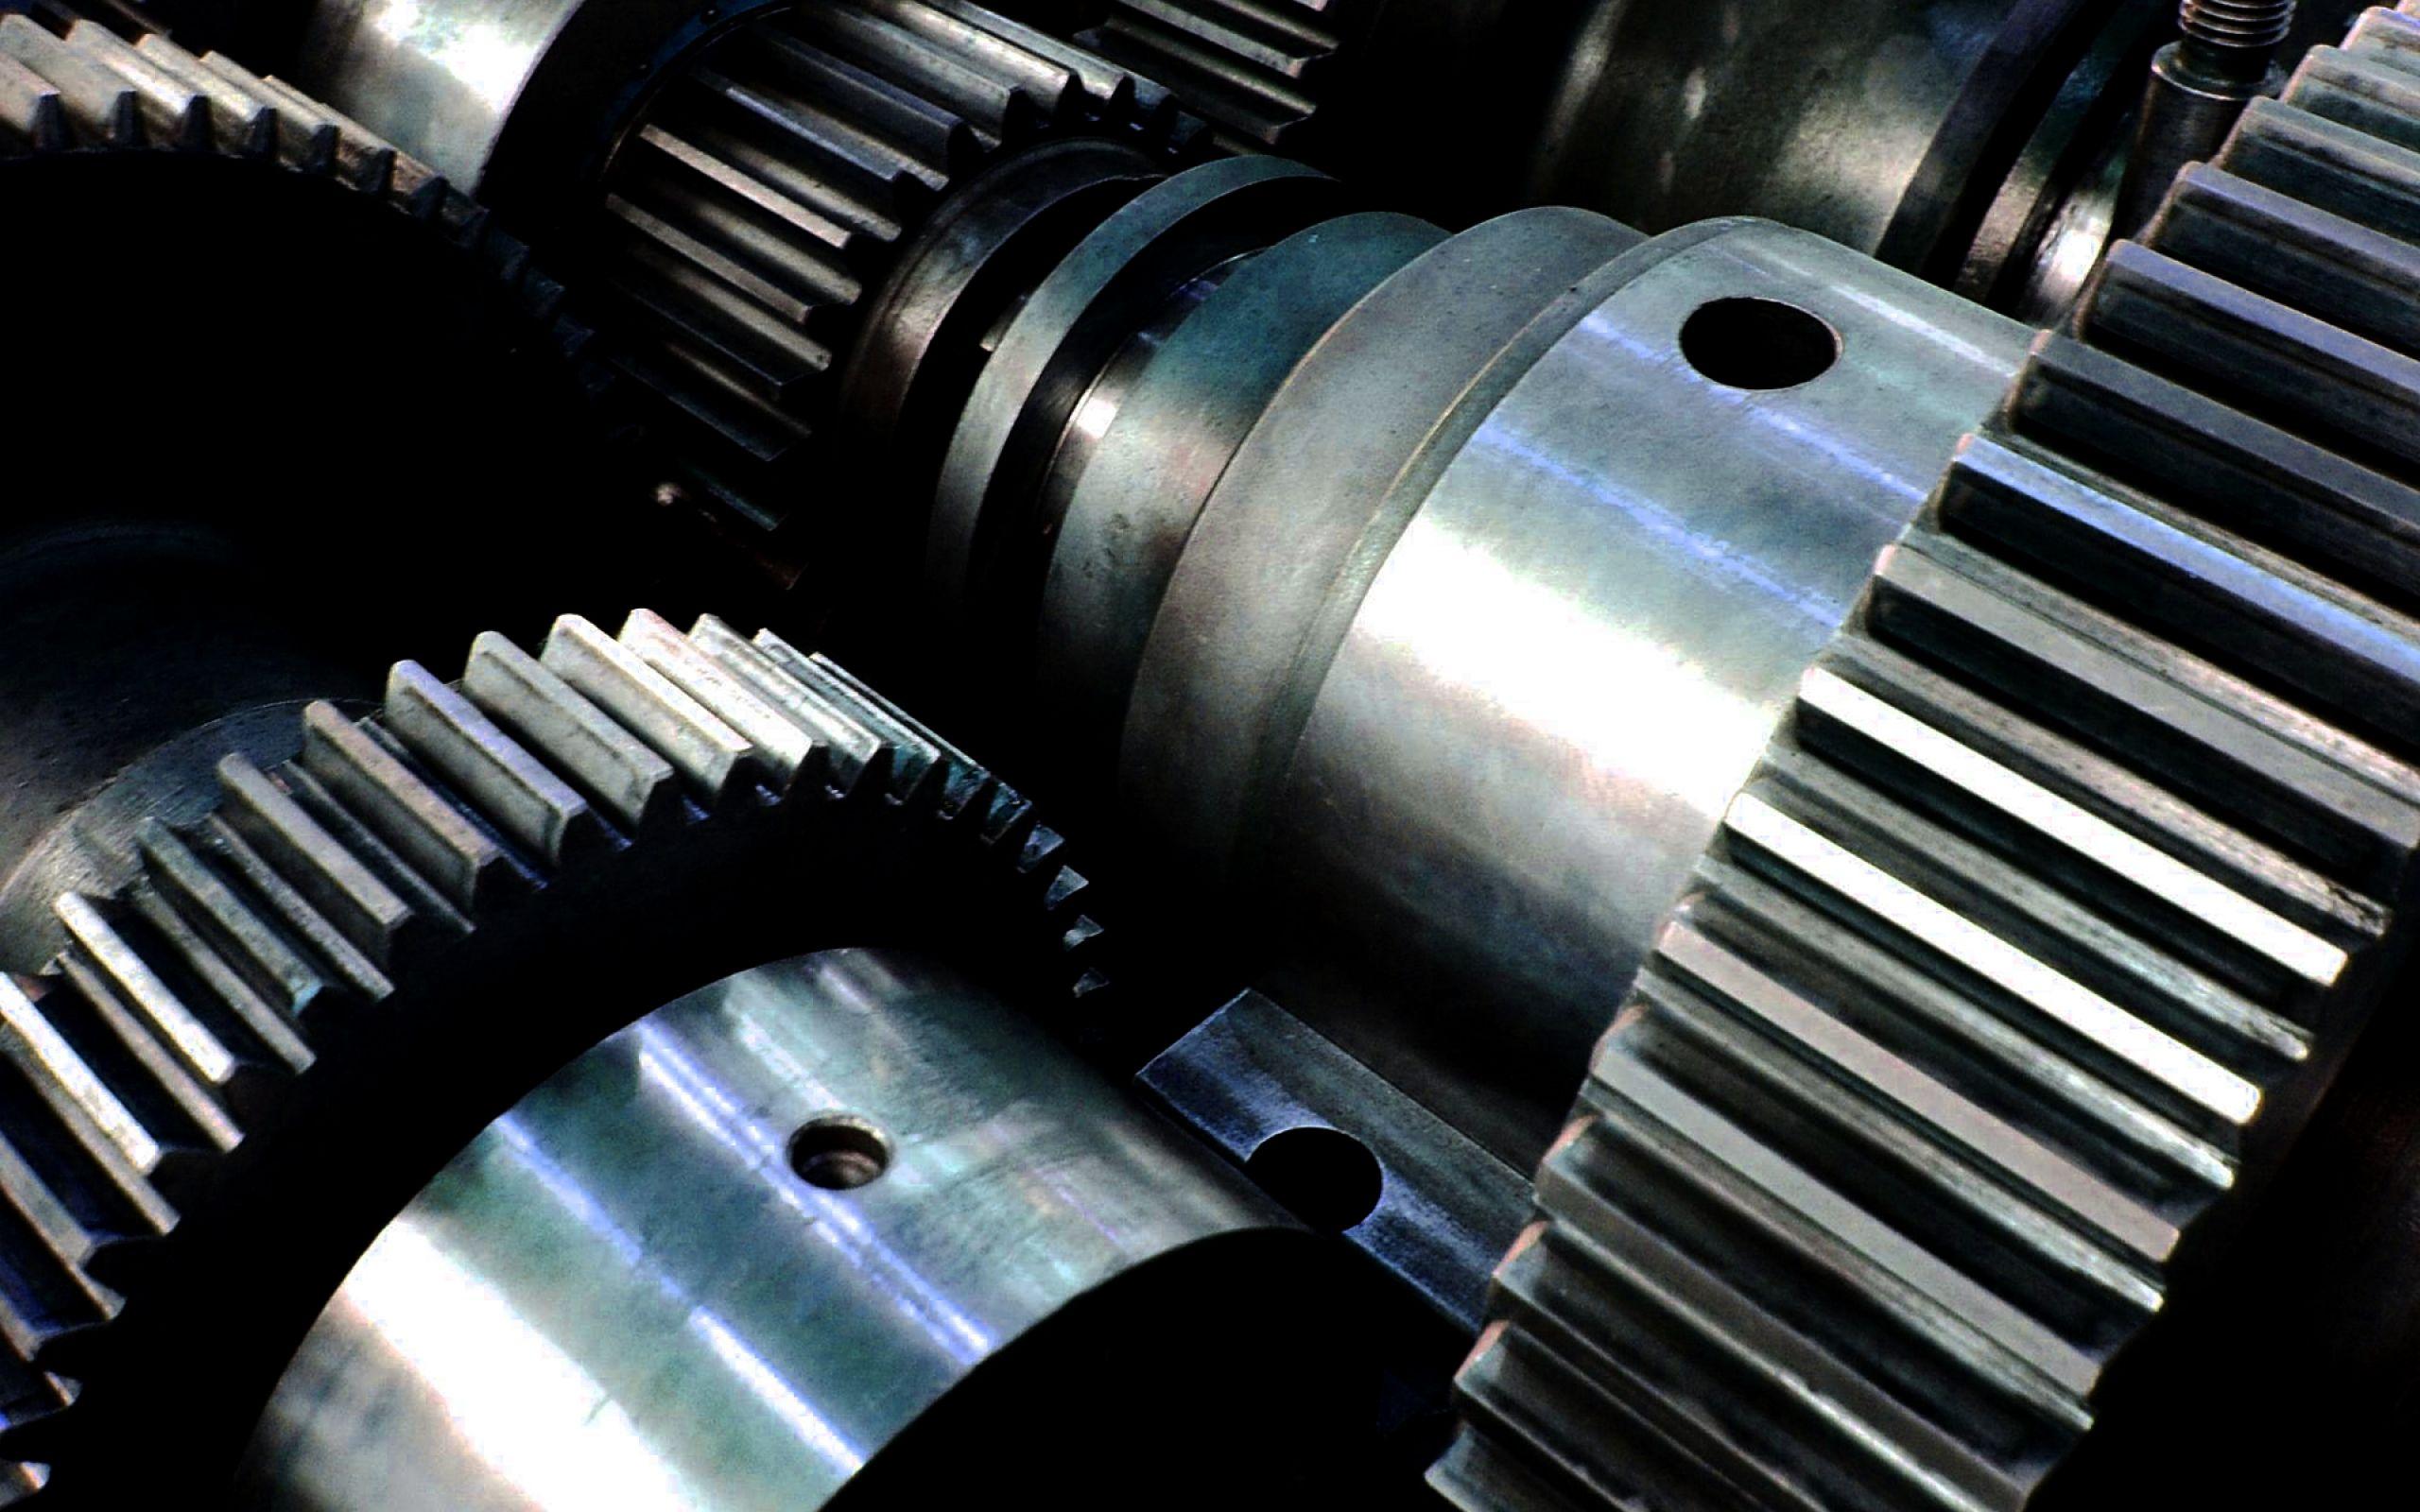 Mechanical Engineering Wallpaper hd Hd wallpapers mechanical gears 2560x1600